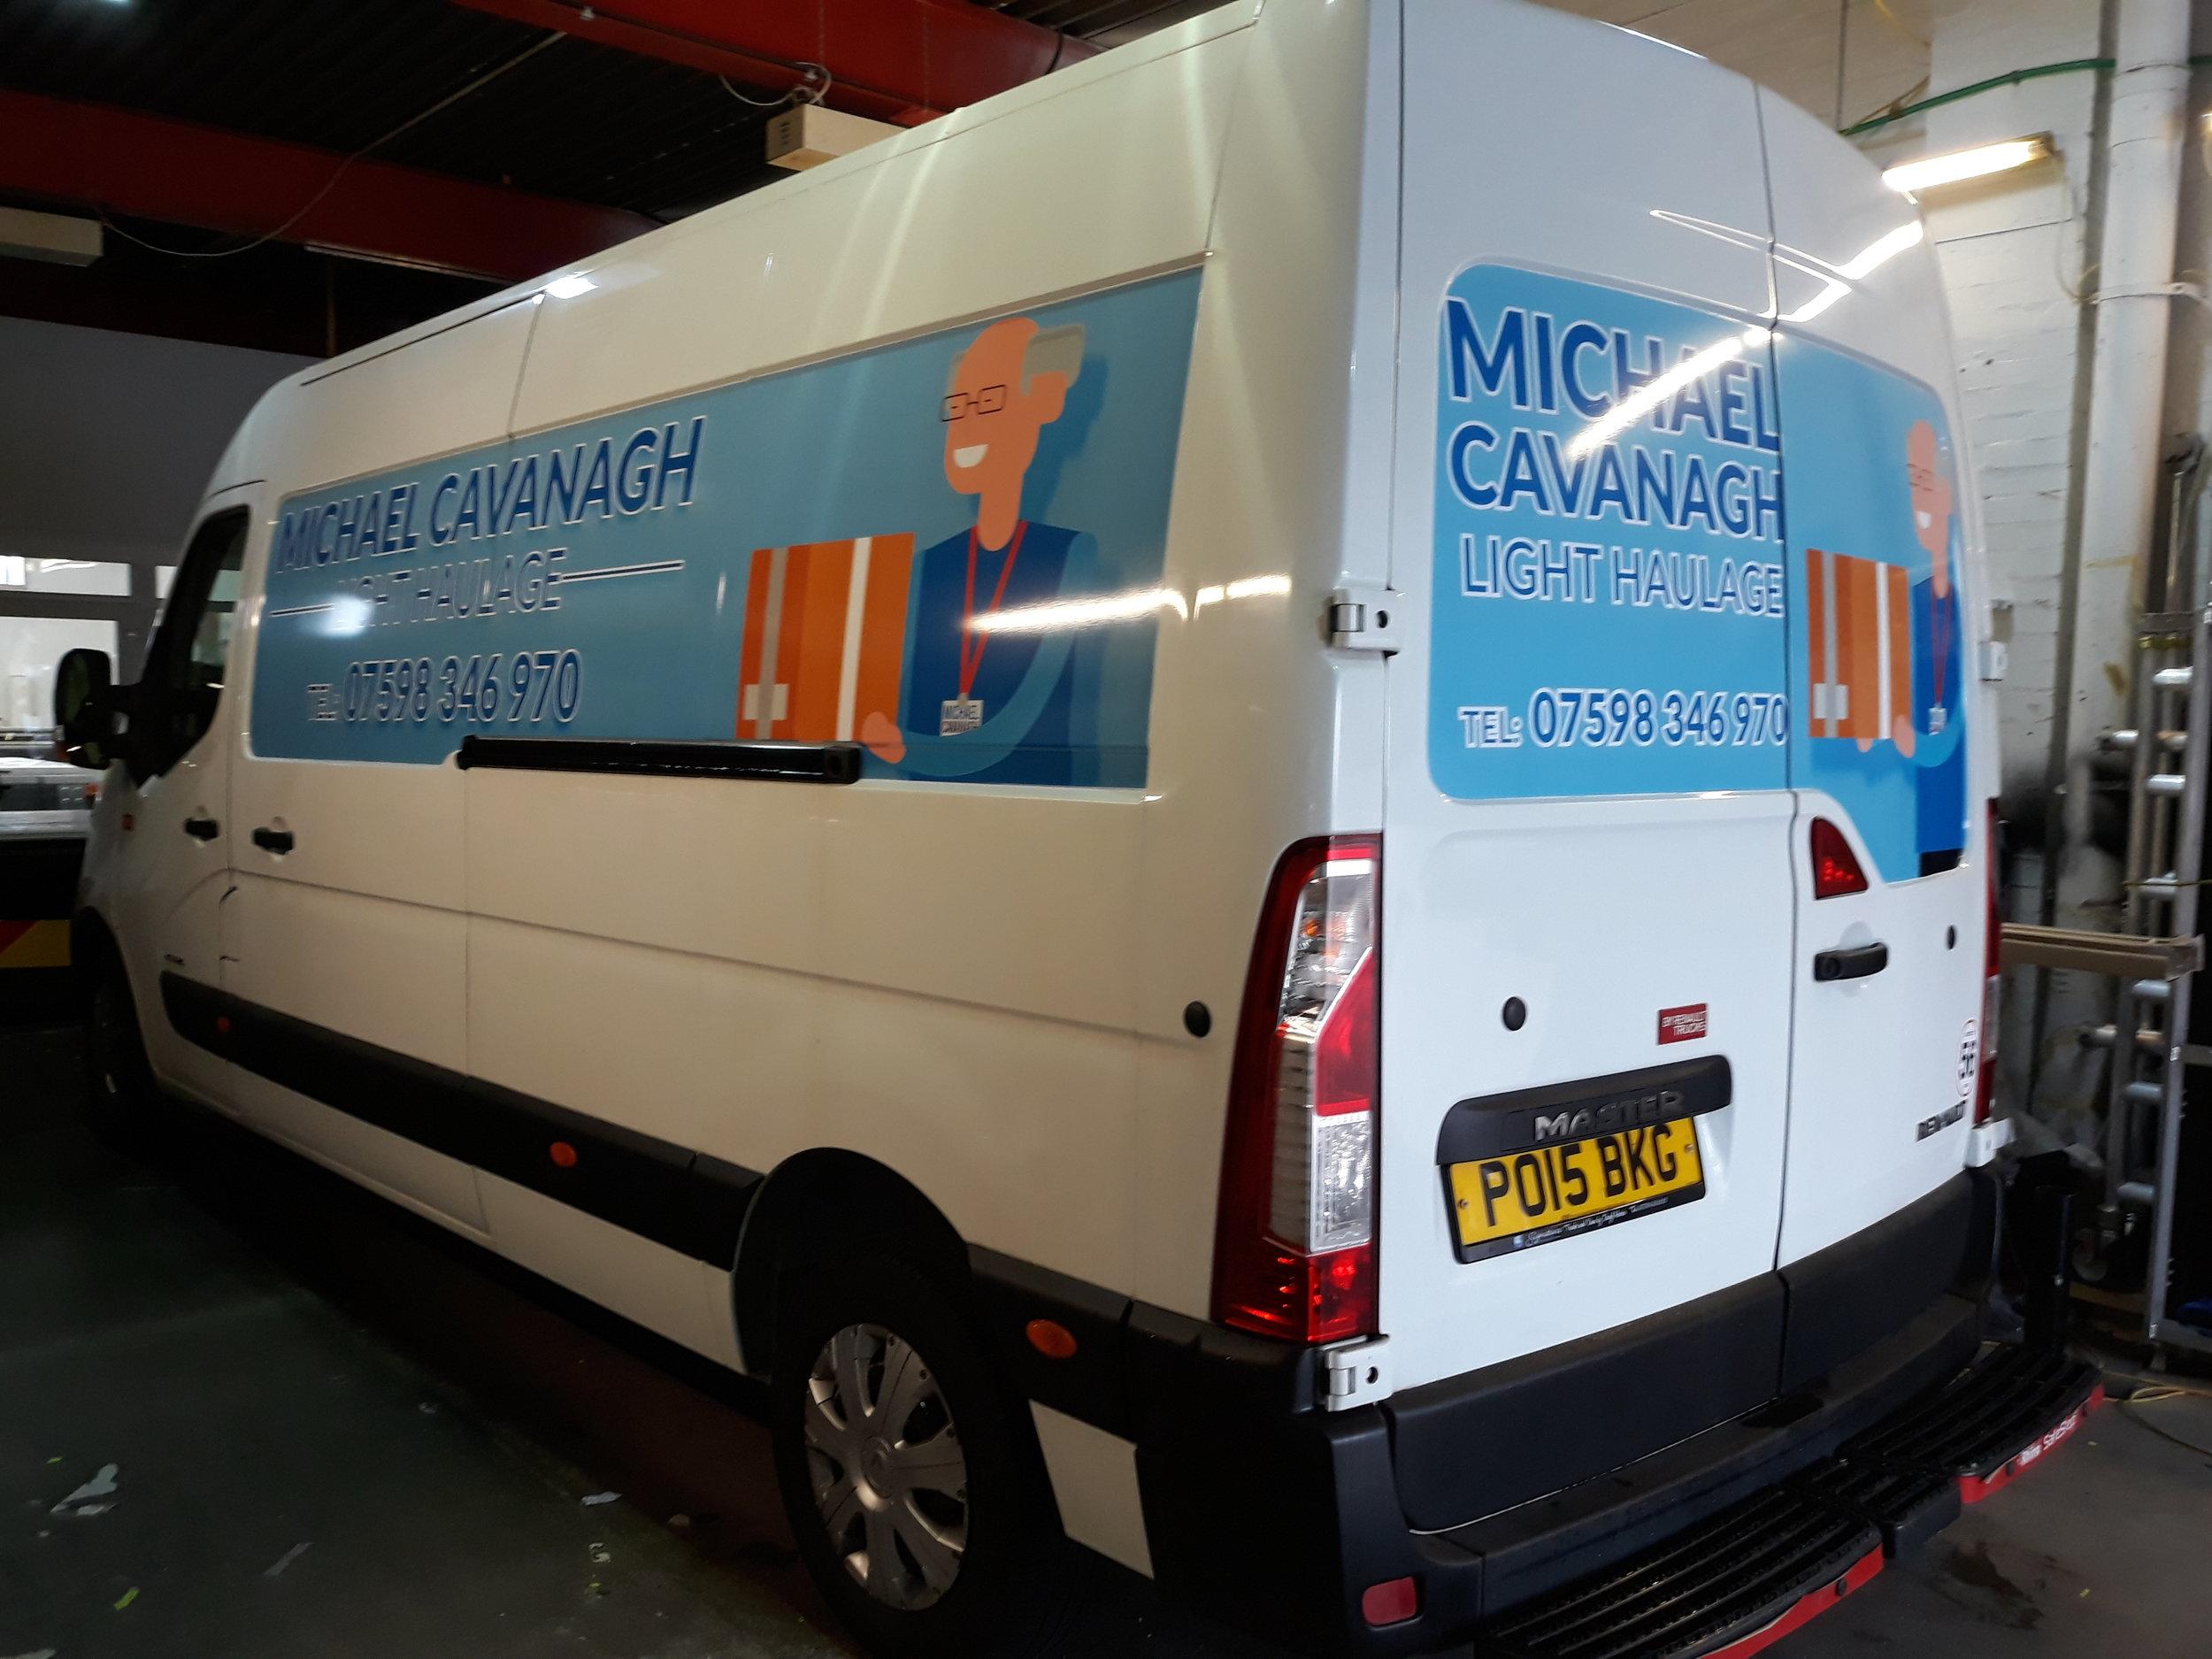 MICHAEL CAVANAGH LIGHT HAULAGE   Standard panel job on a long wheelbase van.